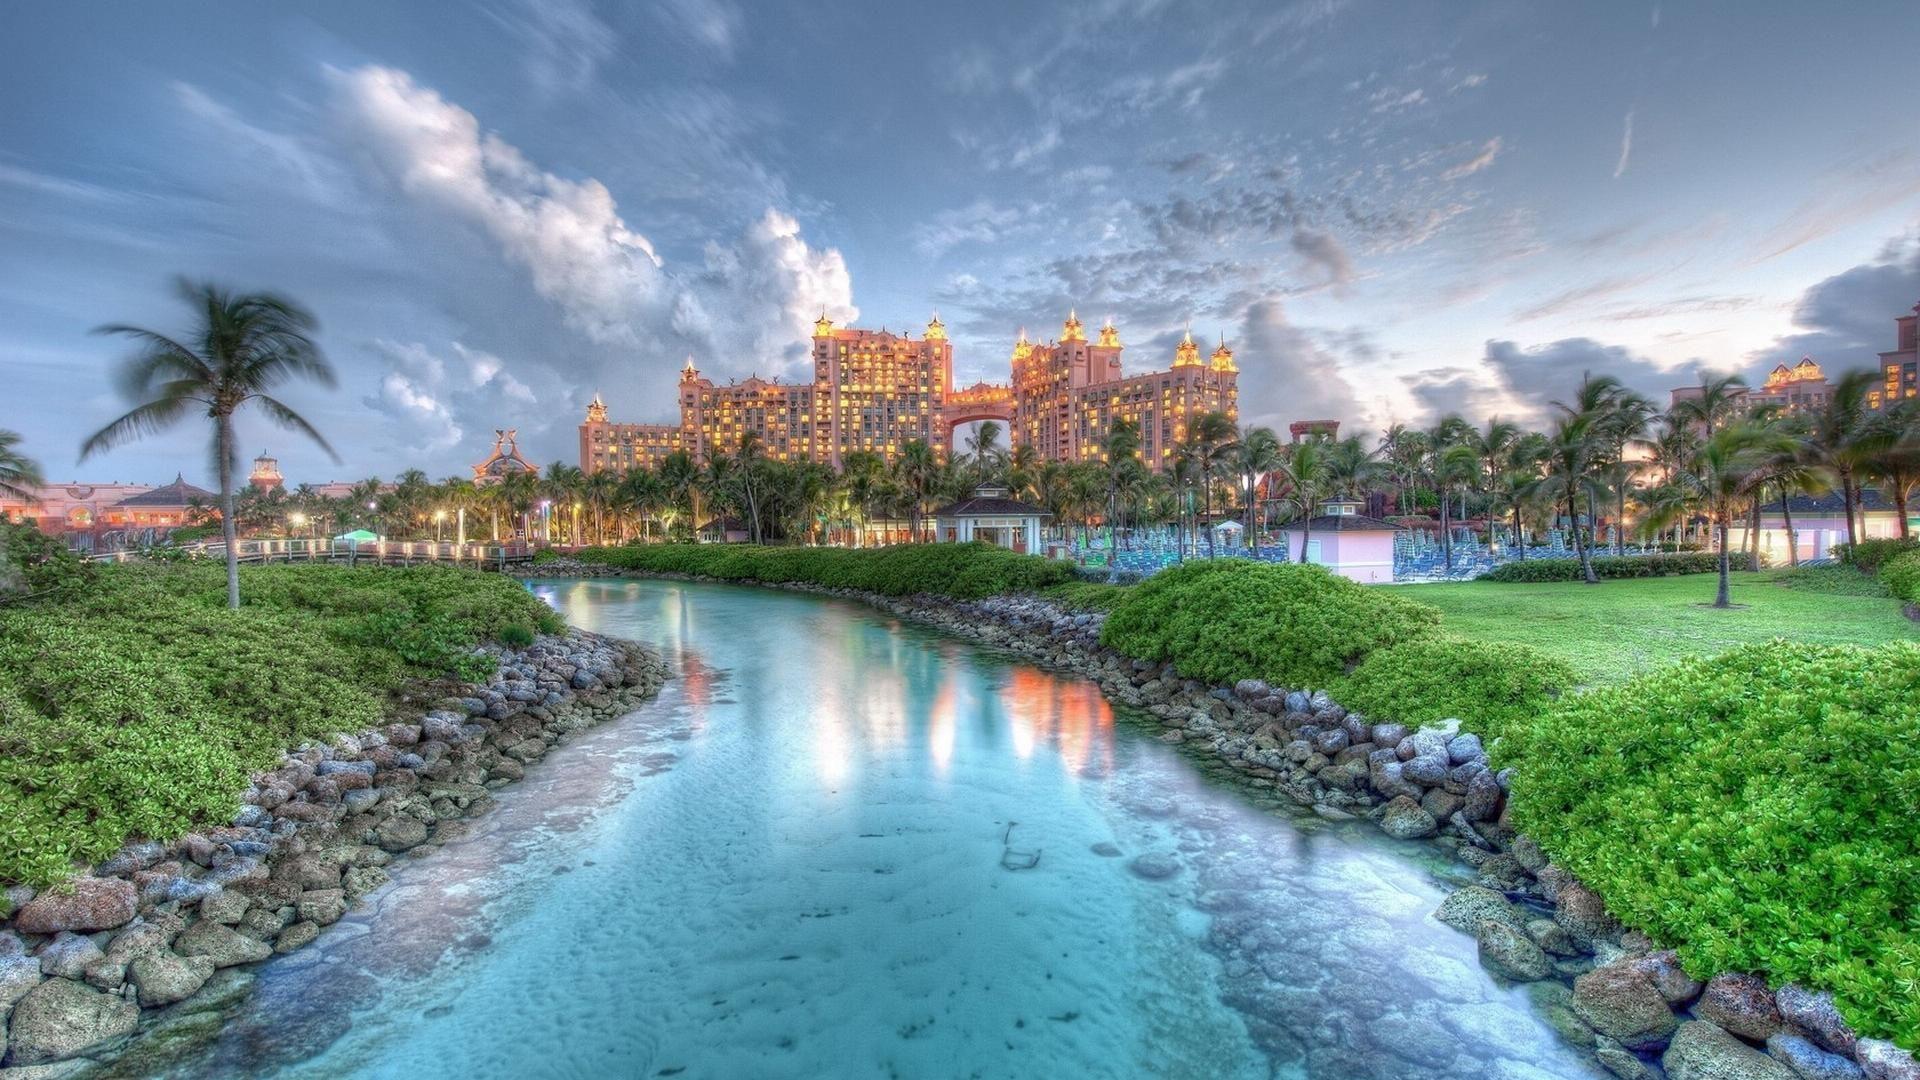 Bahamas wallpaper download